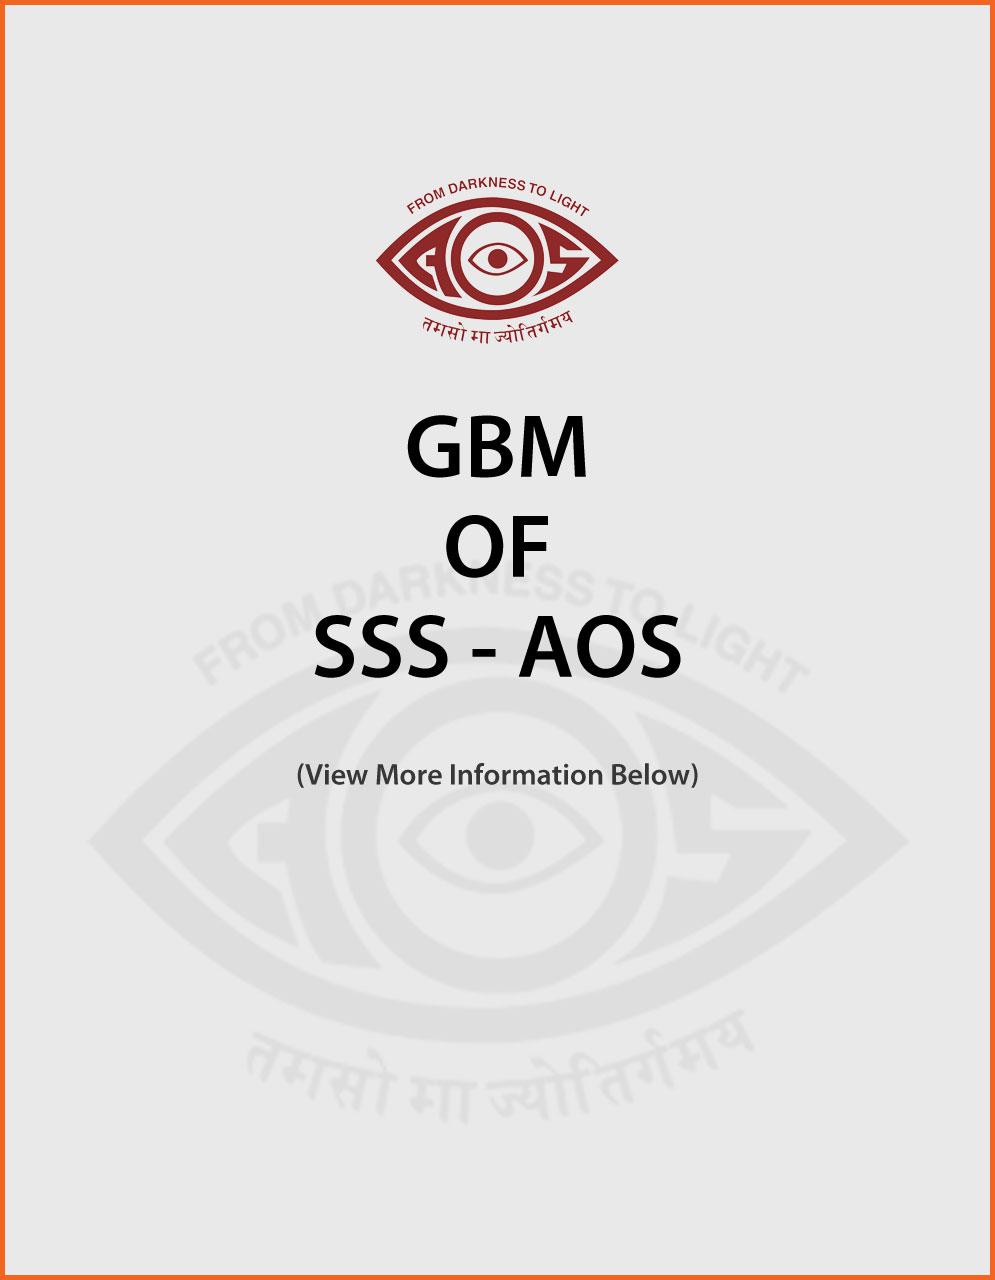 GBM of SSS AOS